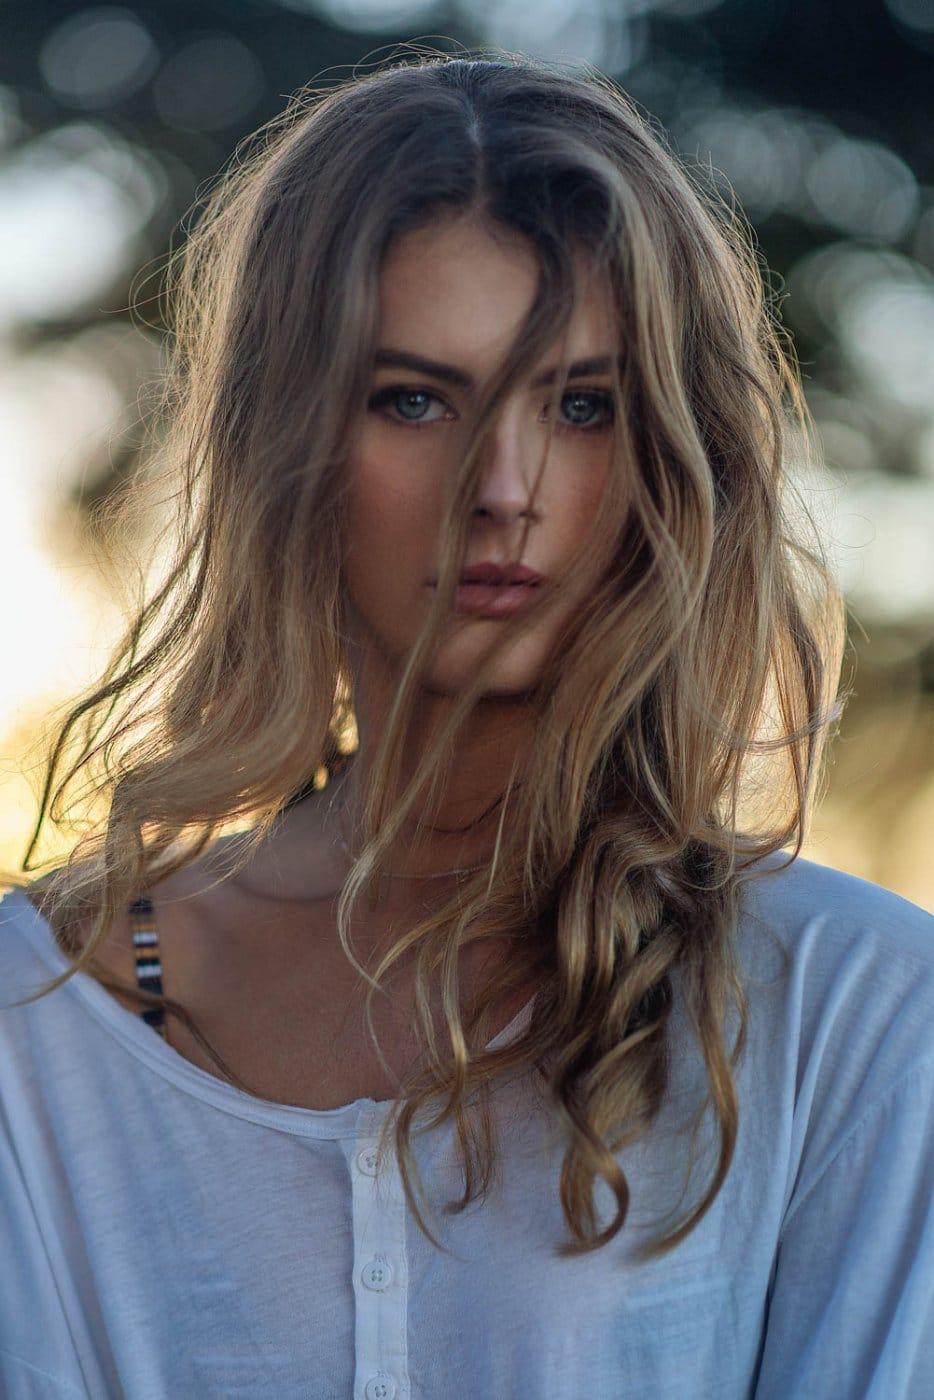 Portrait Photography By Anastasia Vervueren Golden Hour Australia Chadwick Models